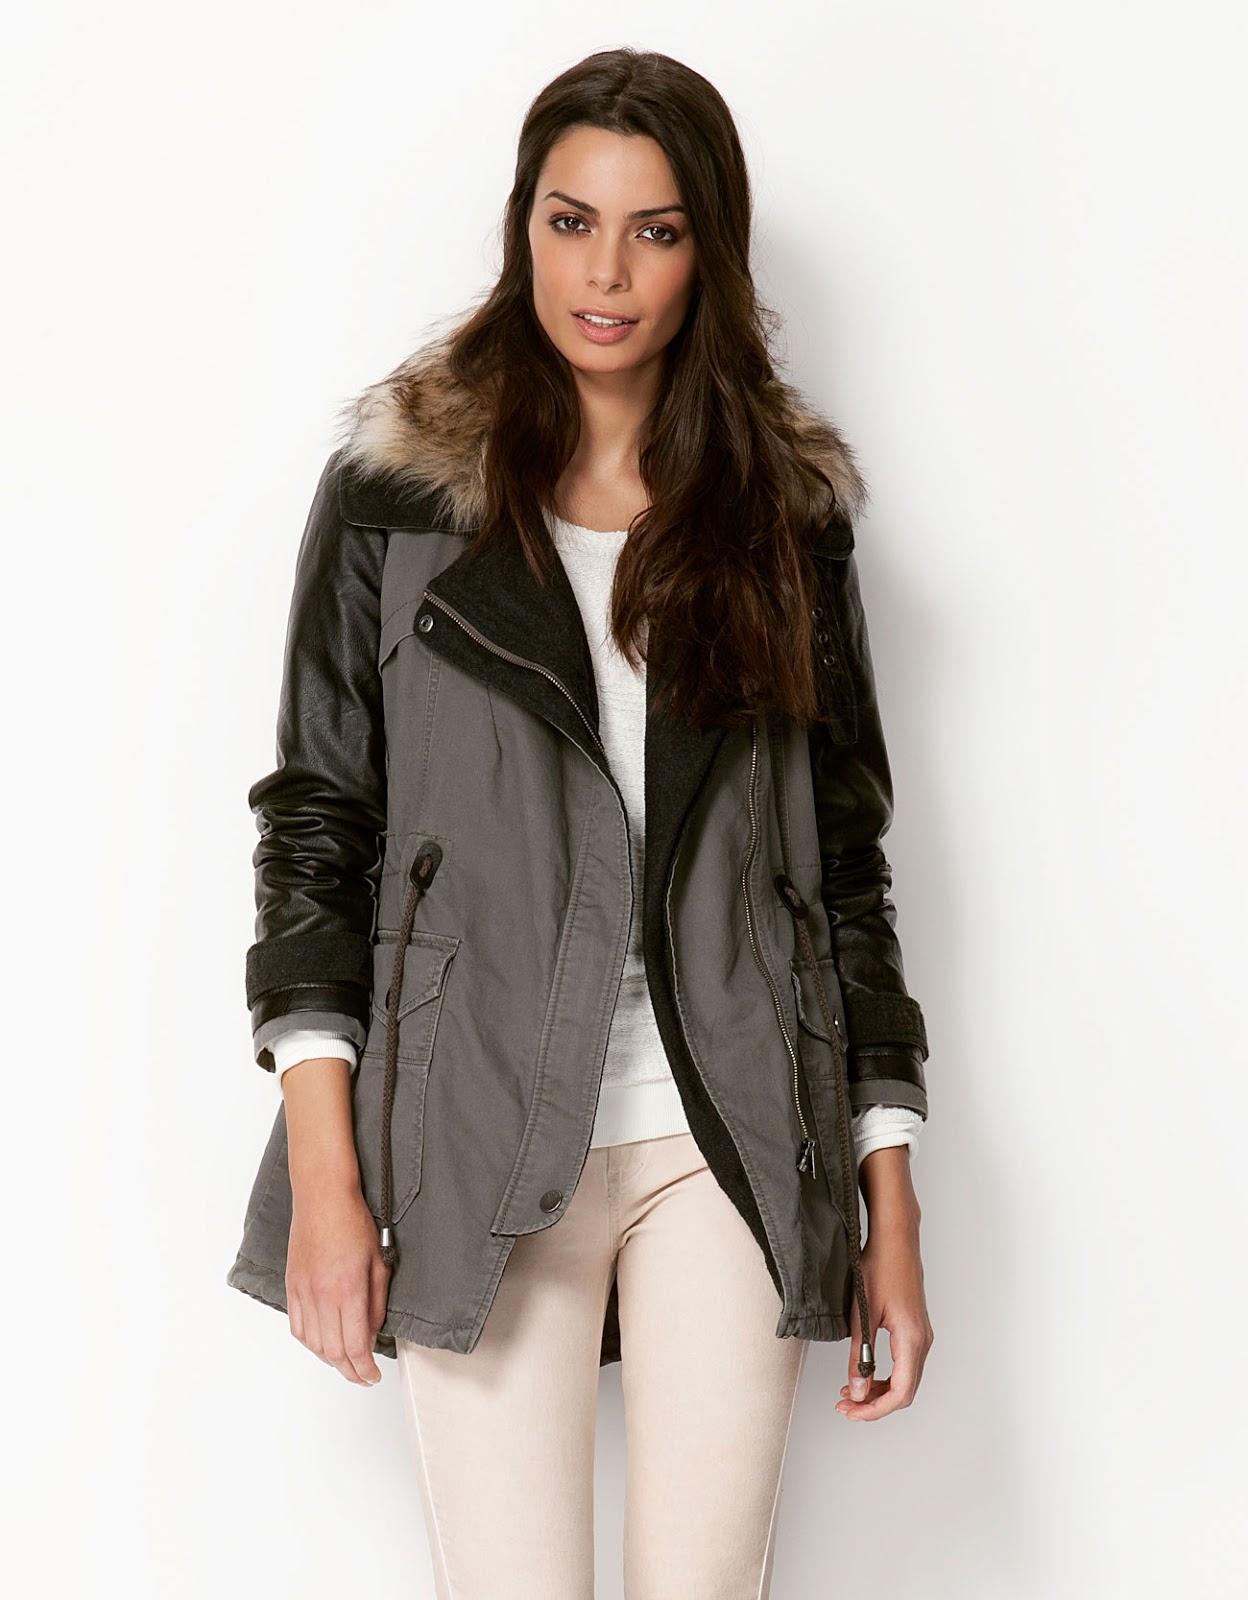 Abrigo gris con mangas de cuero